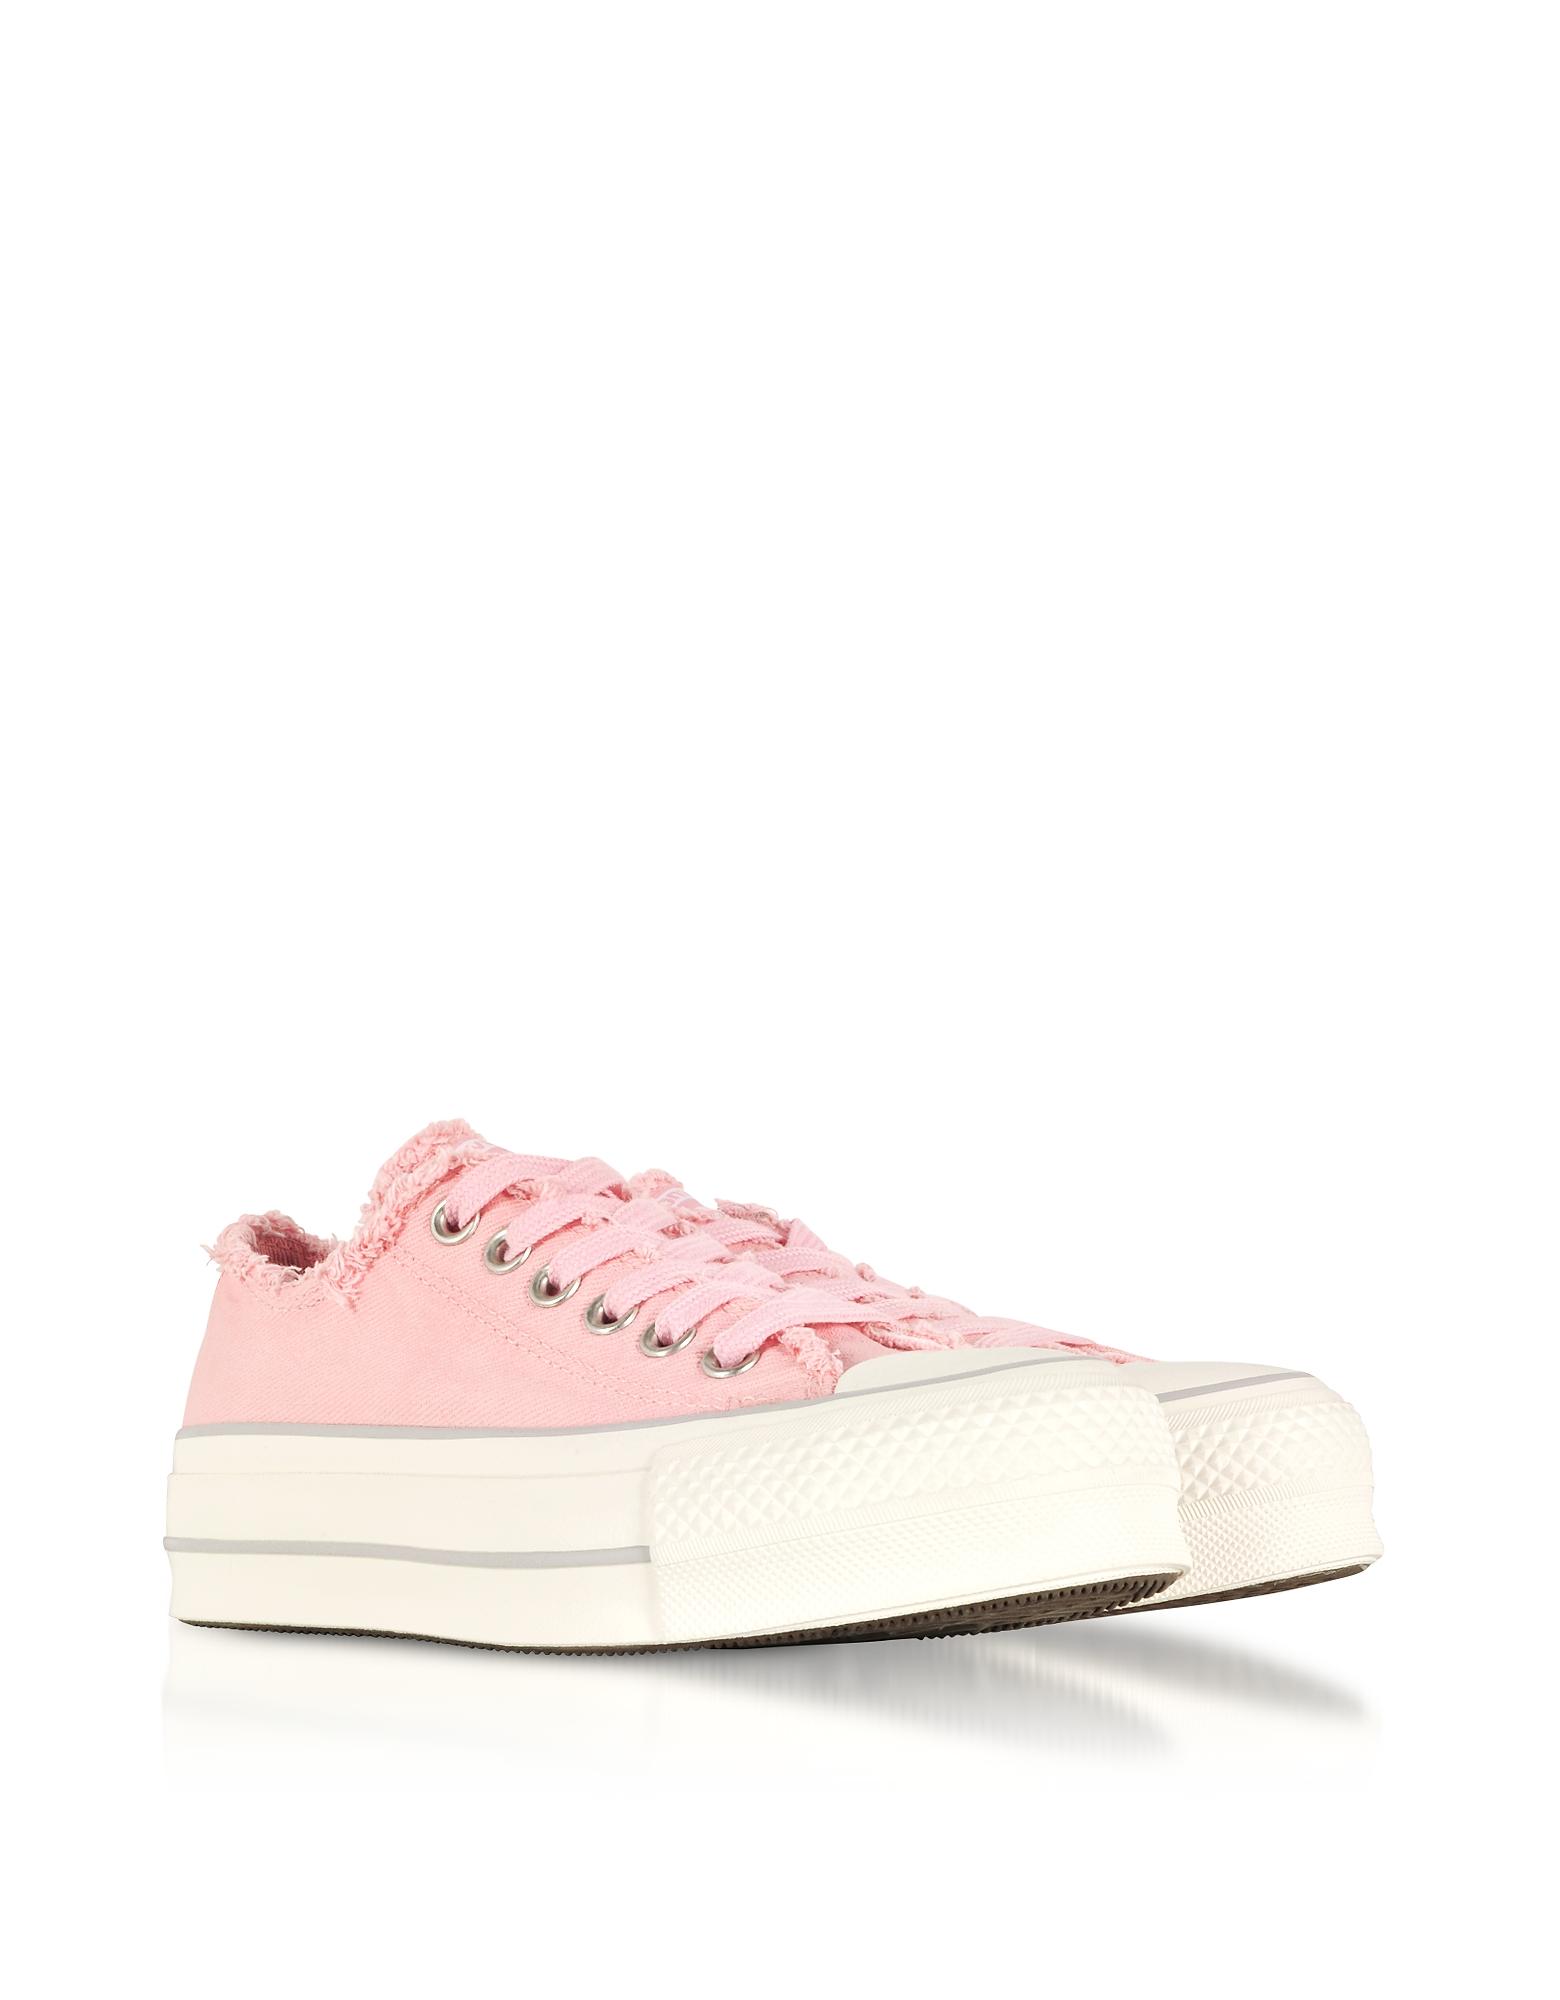 81e59894d966 Converse Women s Canvas Sneakers - Rubber sole